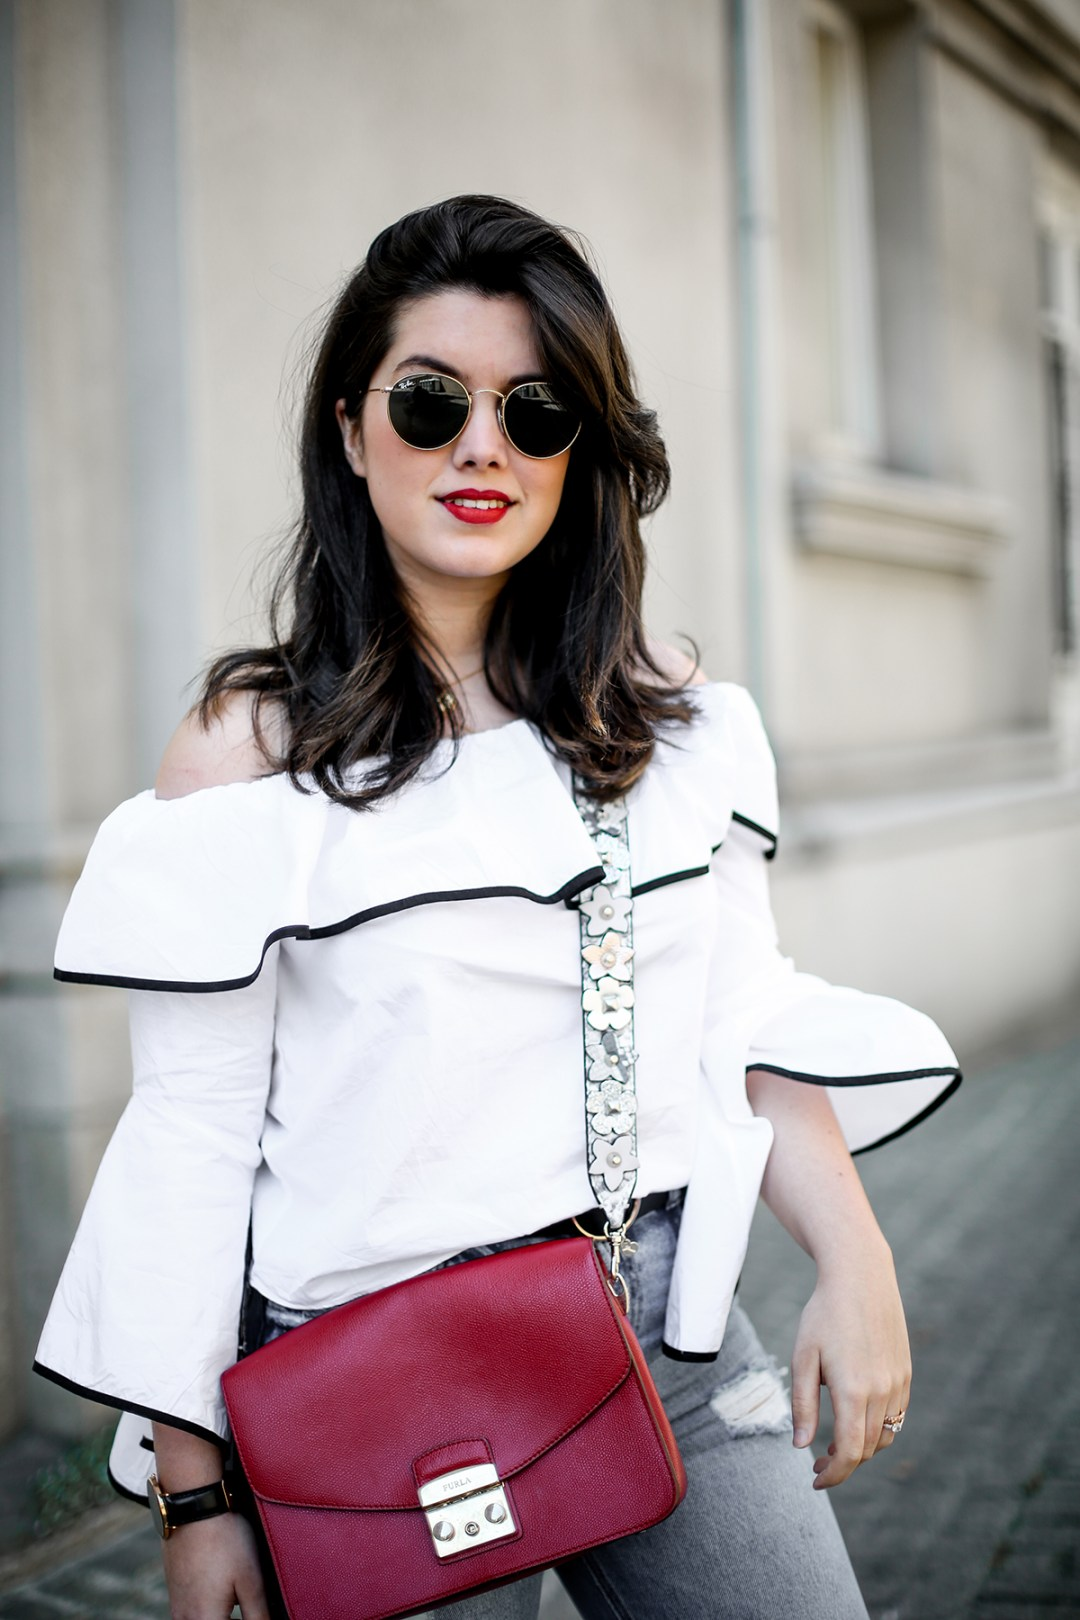 top-hombros-al-aire-volantes-zara-jeans-slingback-chanel-myblueberrynightsblog14